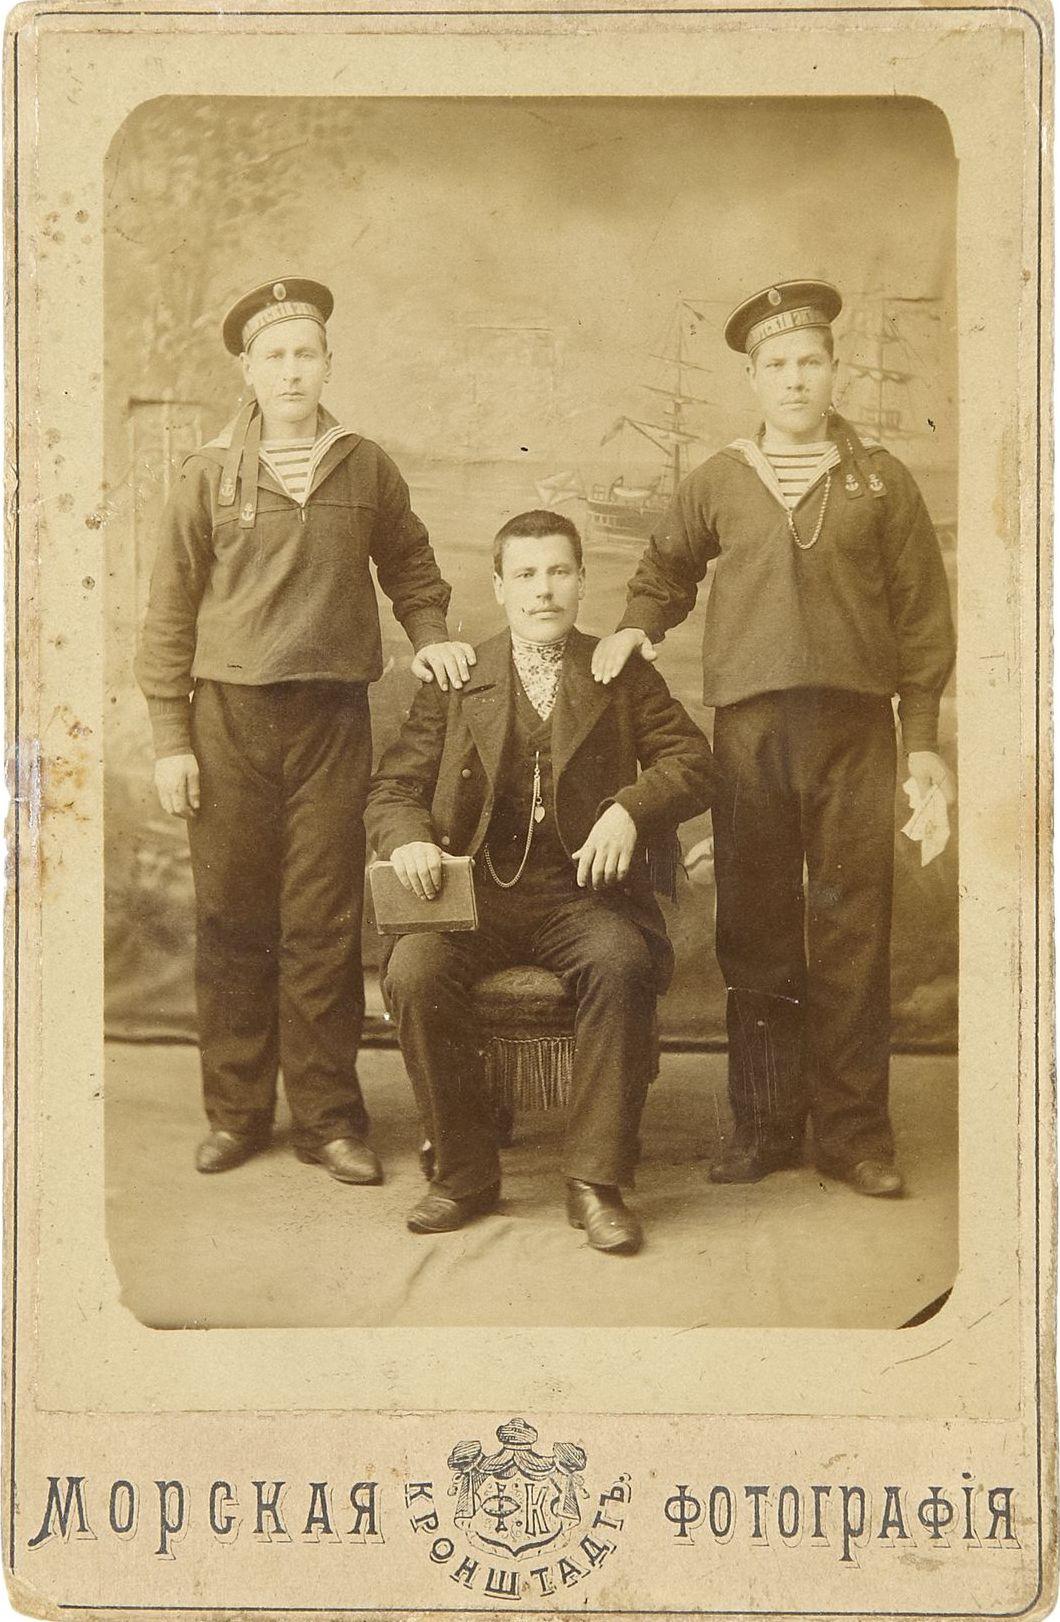 Фото матросов Российского Императорского флота.  Кронштадт, 1880-1890-е